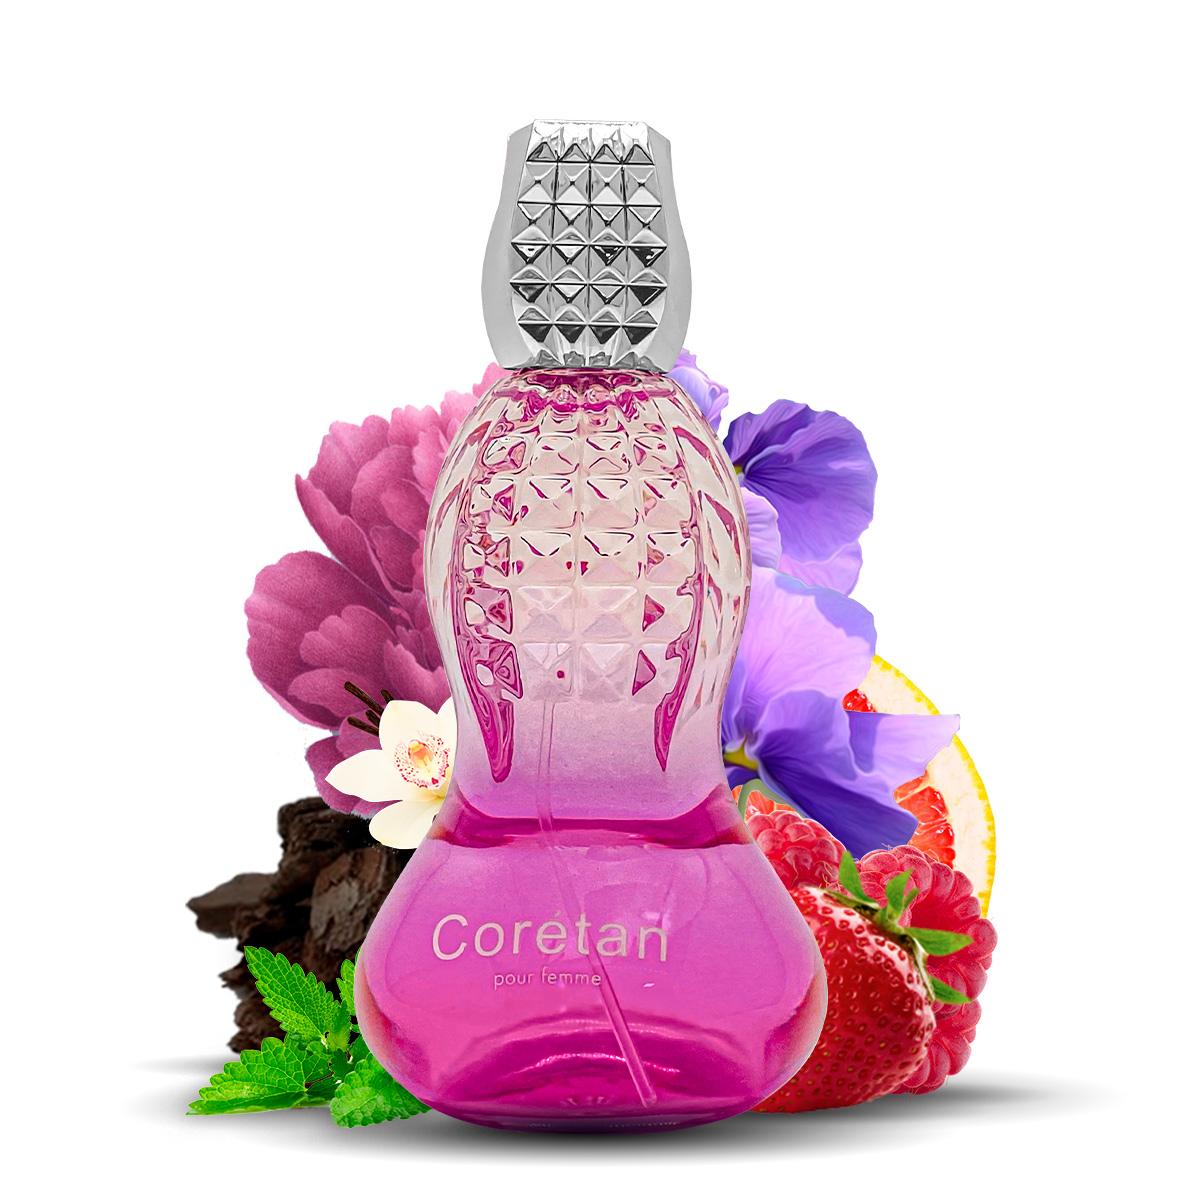 Kit 2 Perfumes Importados Chic e Coretan I Scents